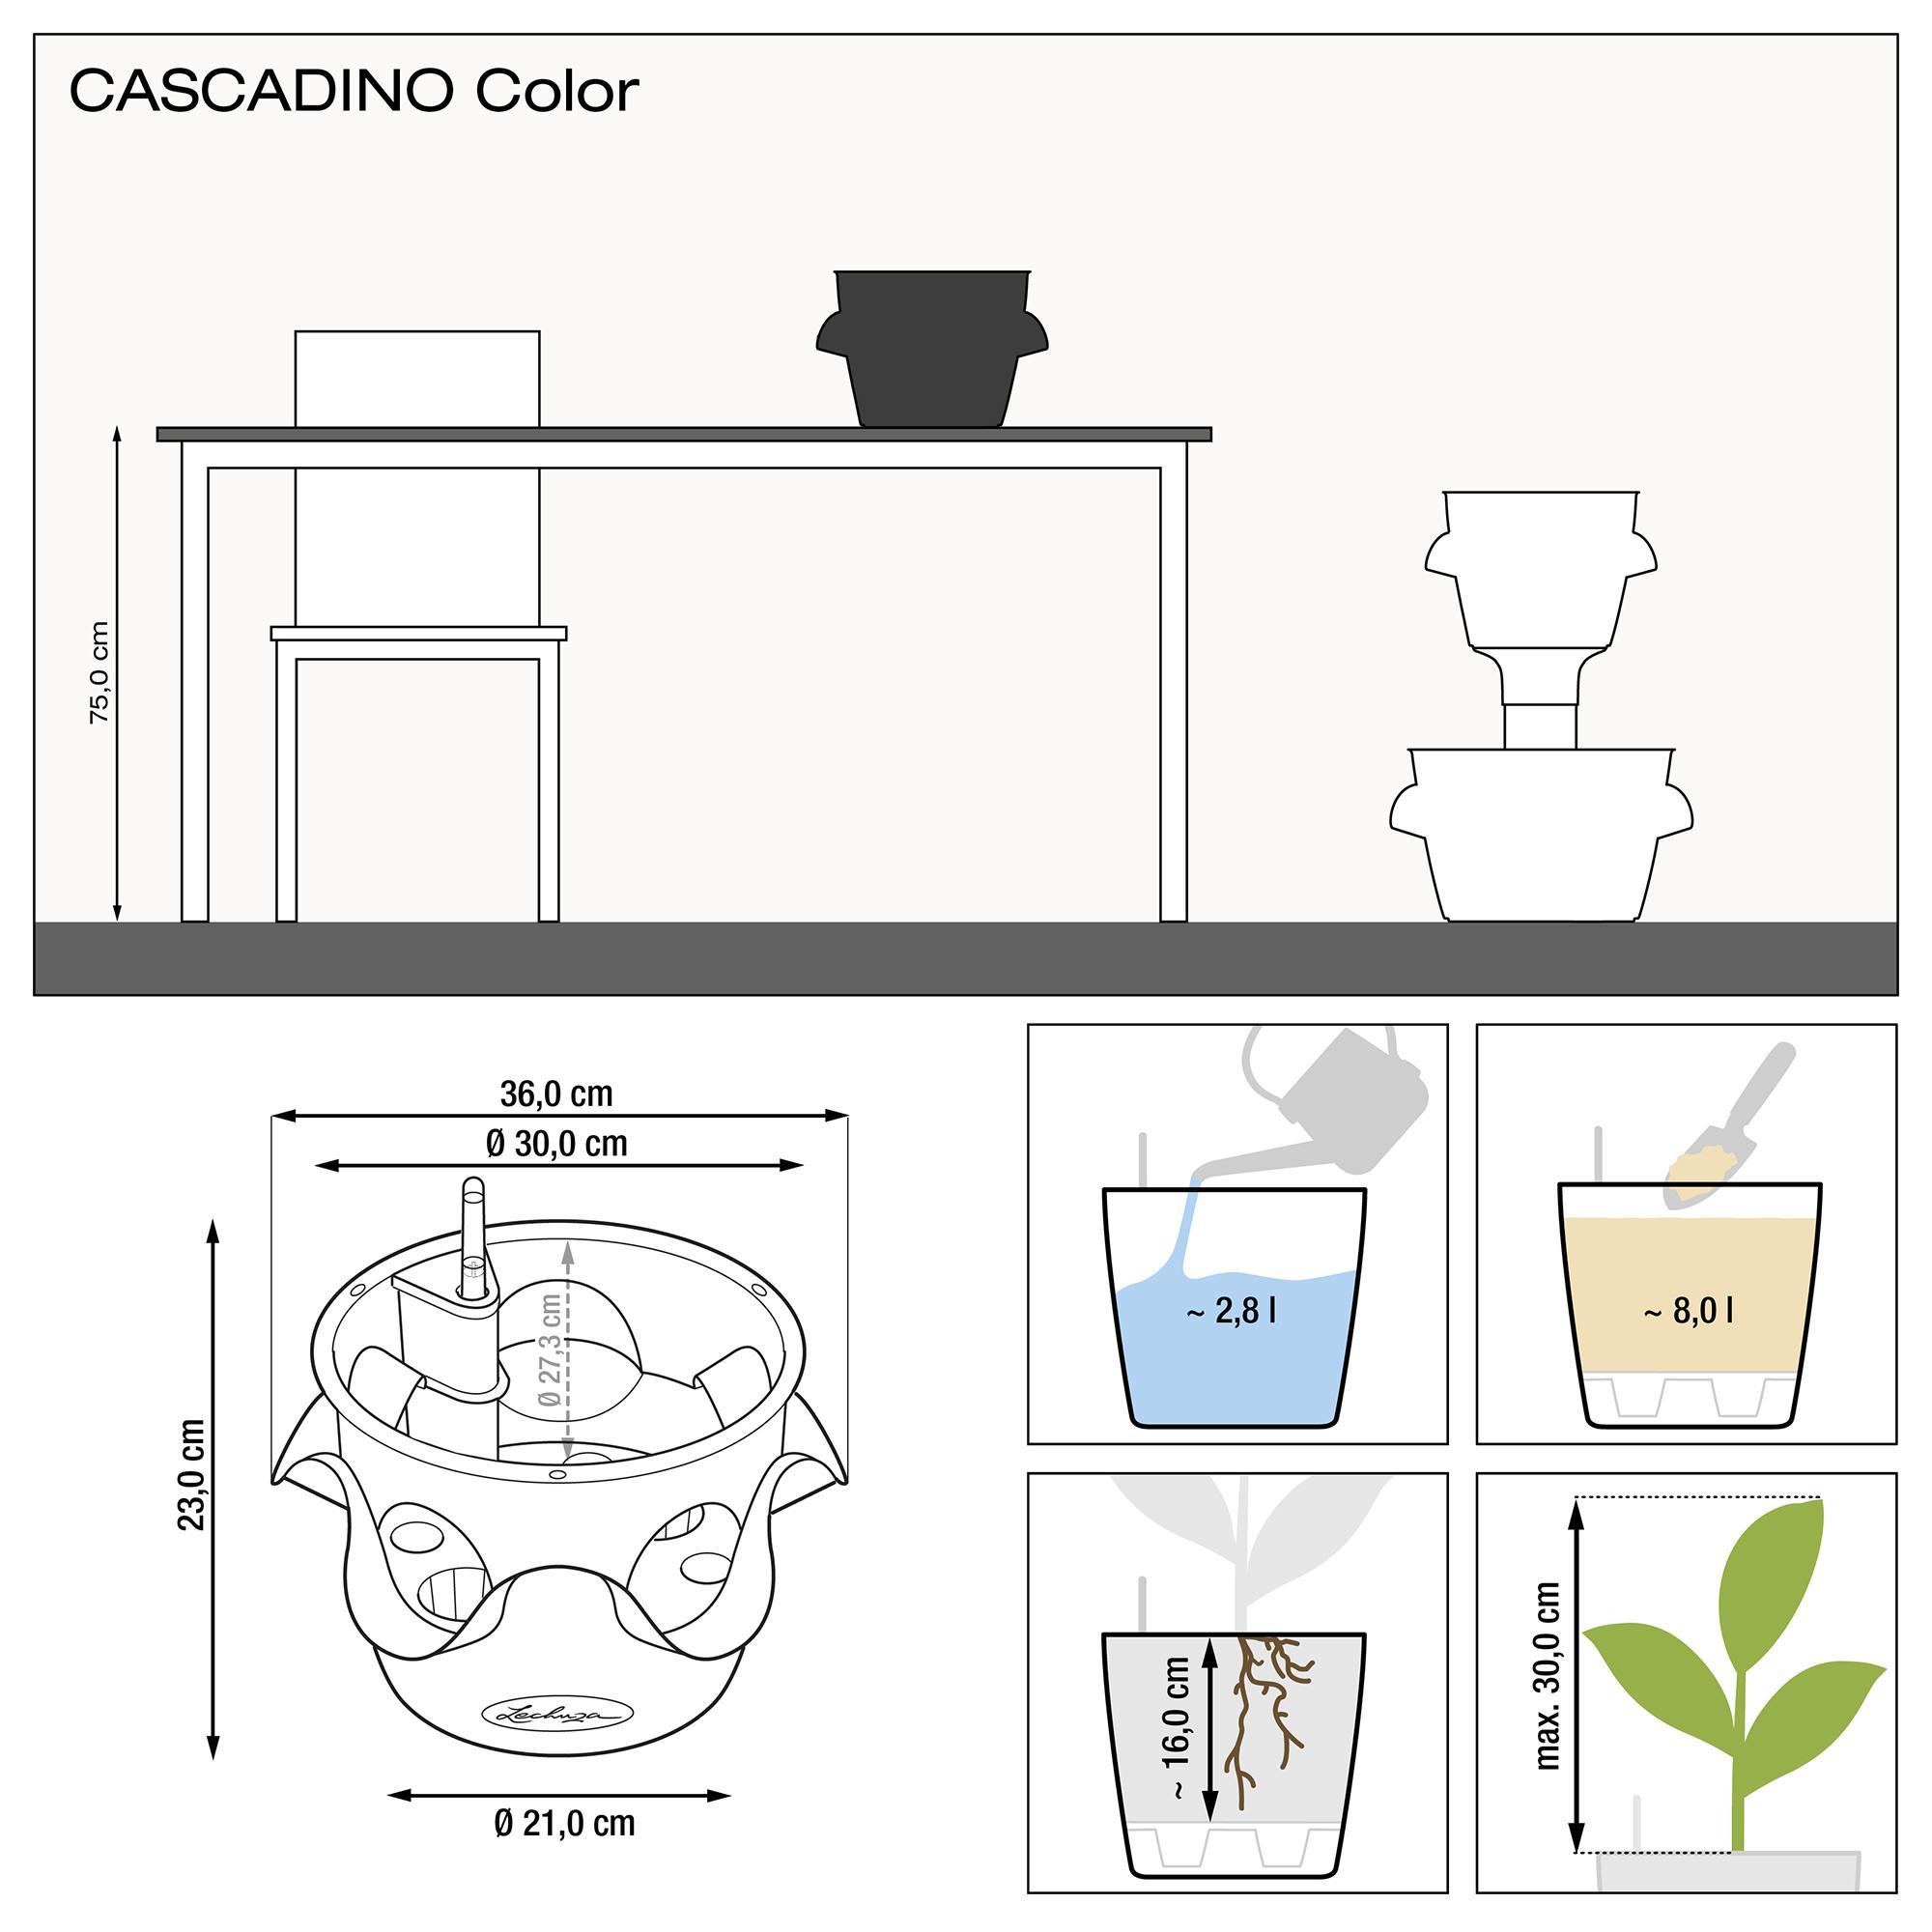 CASCADINO Color фисташковый - изображение 2